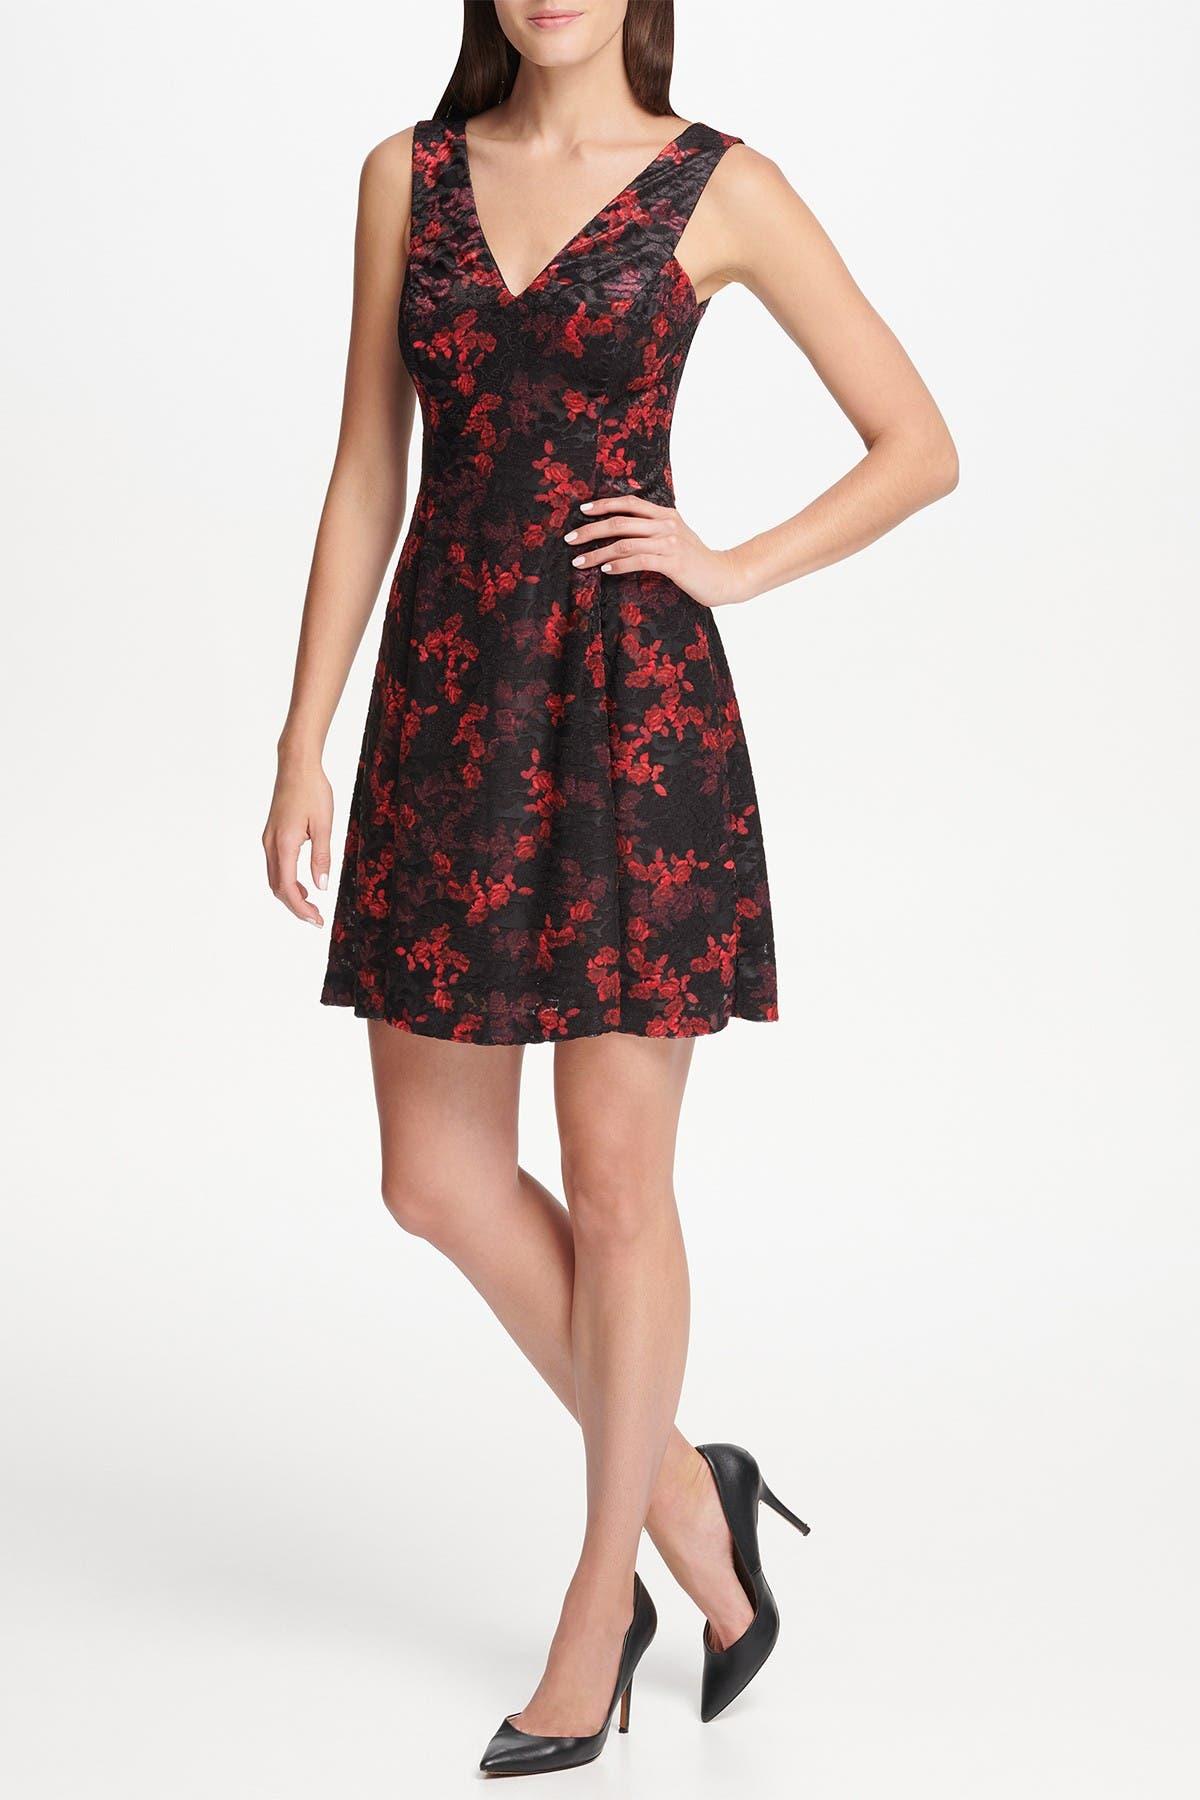 Image of Kensie Burnout Velvet V-Neck Fit & Flare Mini Dress